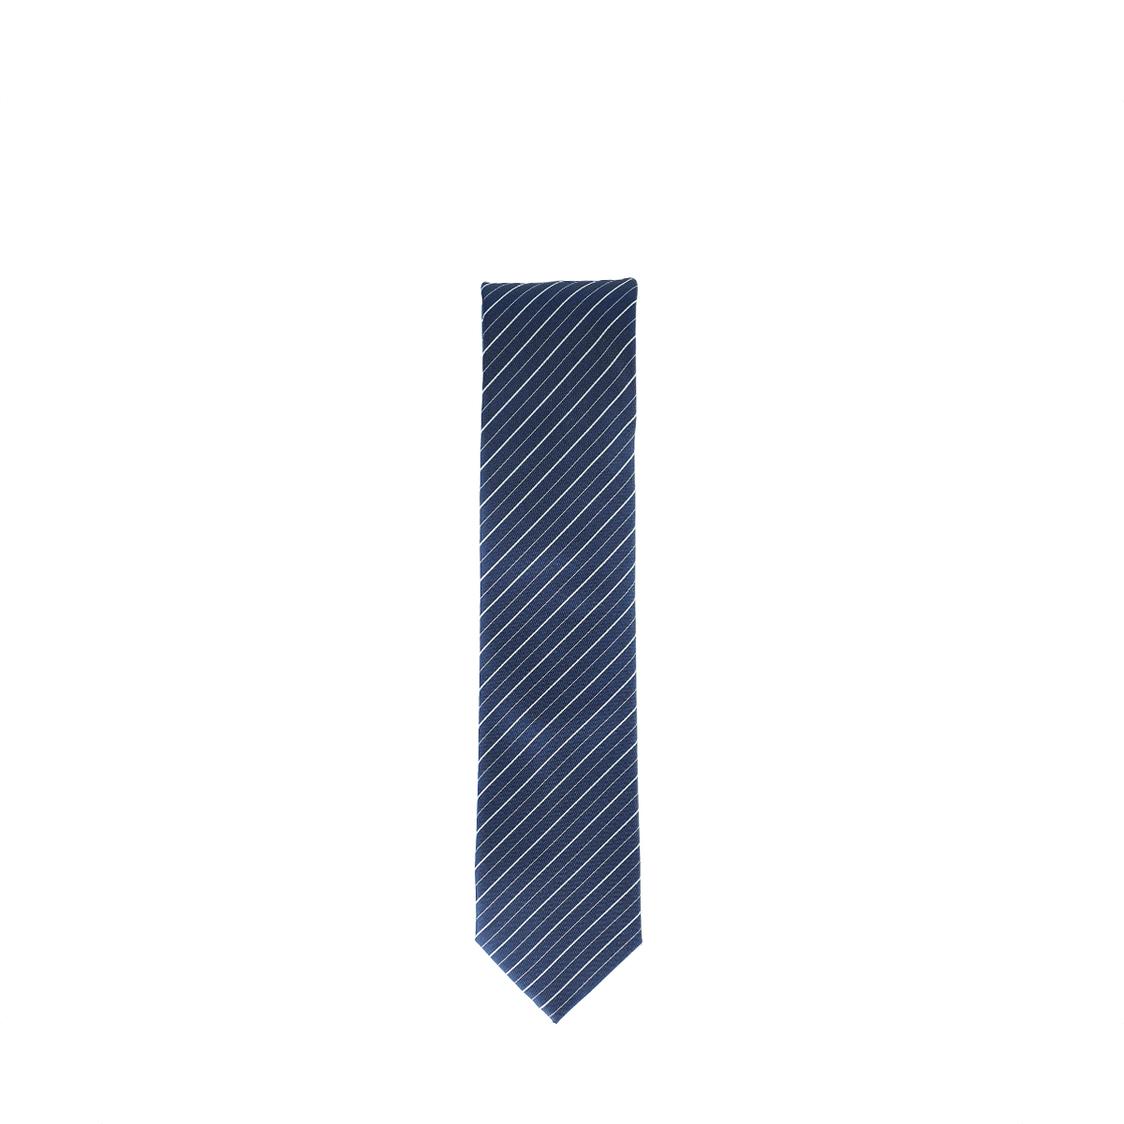 Pierre Cardin 100 Micro Polyester 7cm Blue Tie